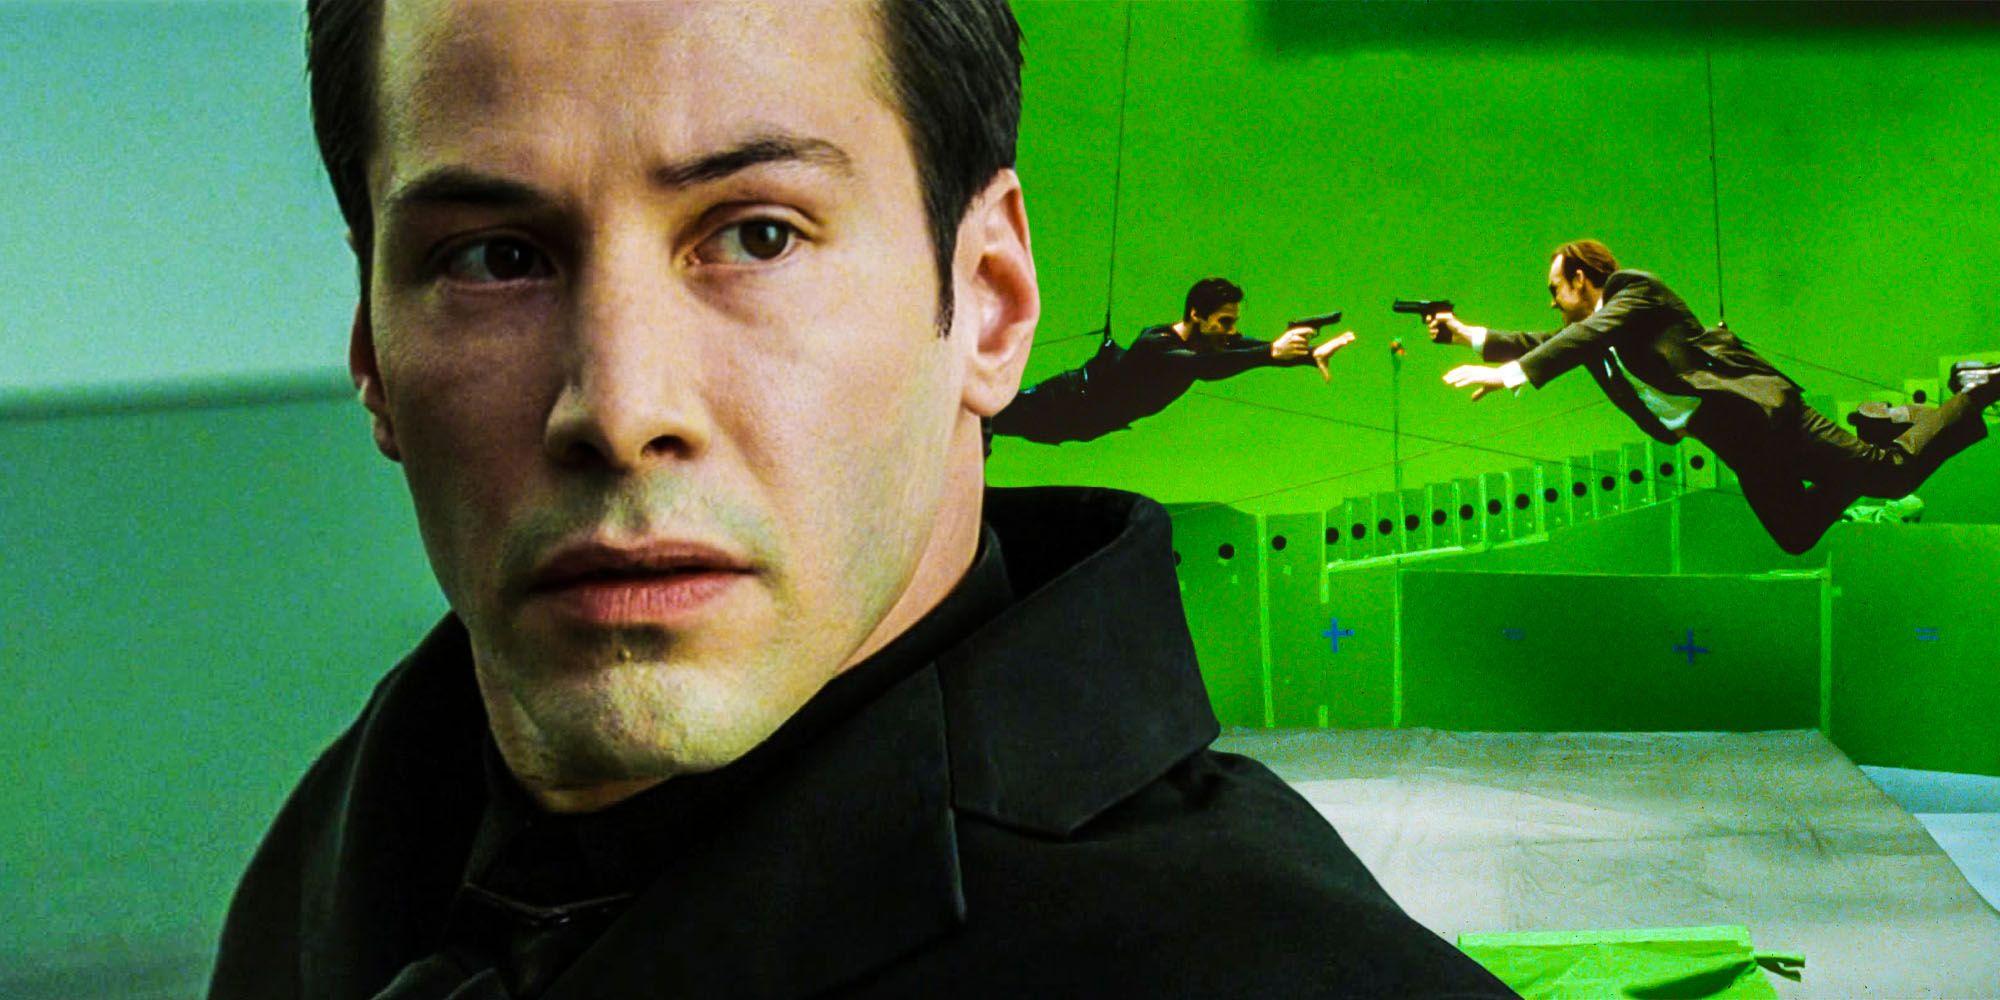 The Matrix 4 Plot Rumors: Lambert Wilson as The